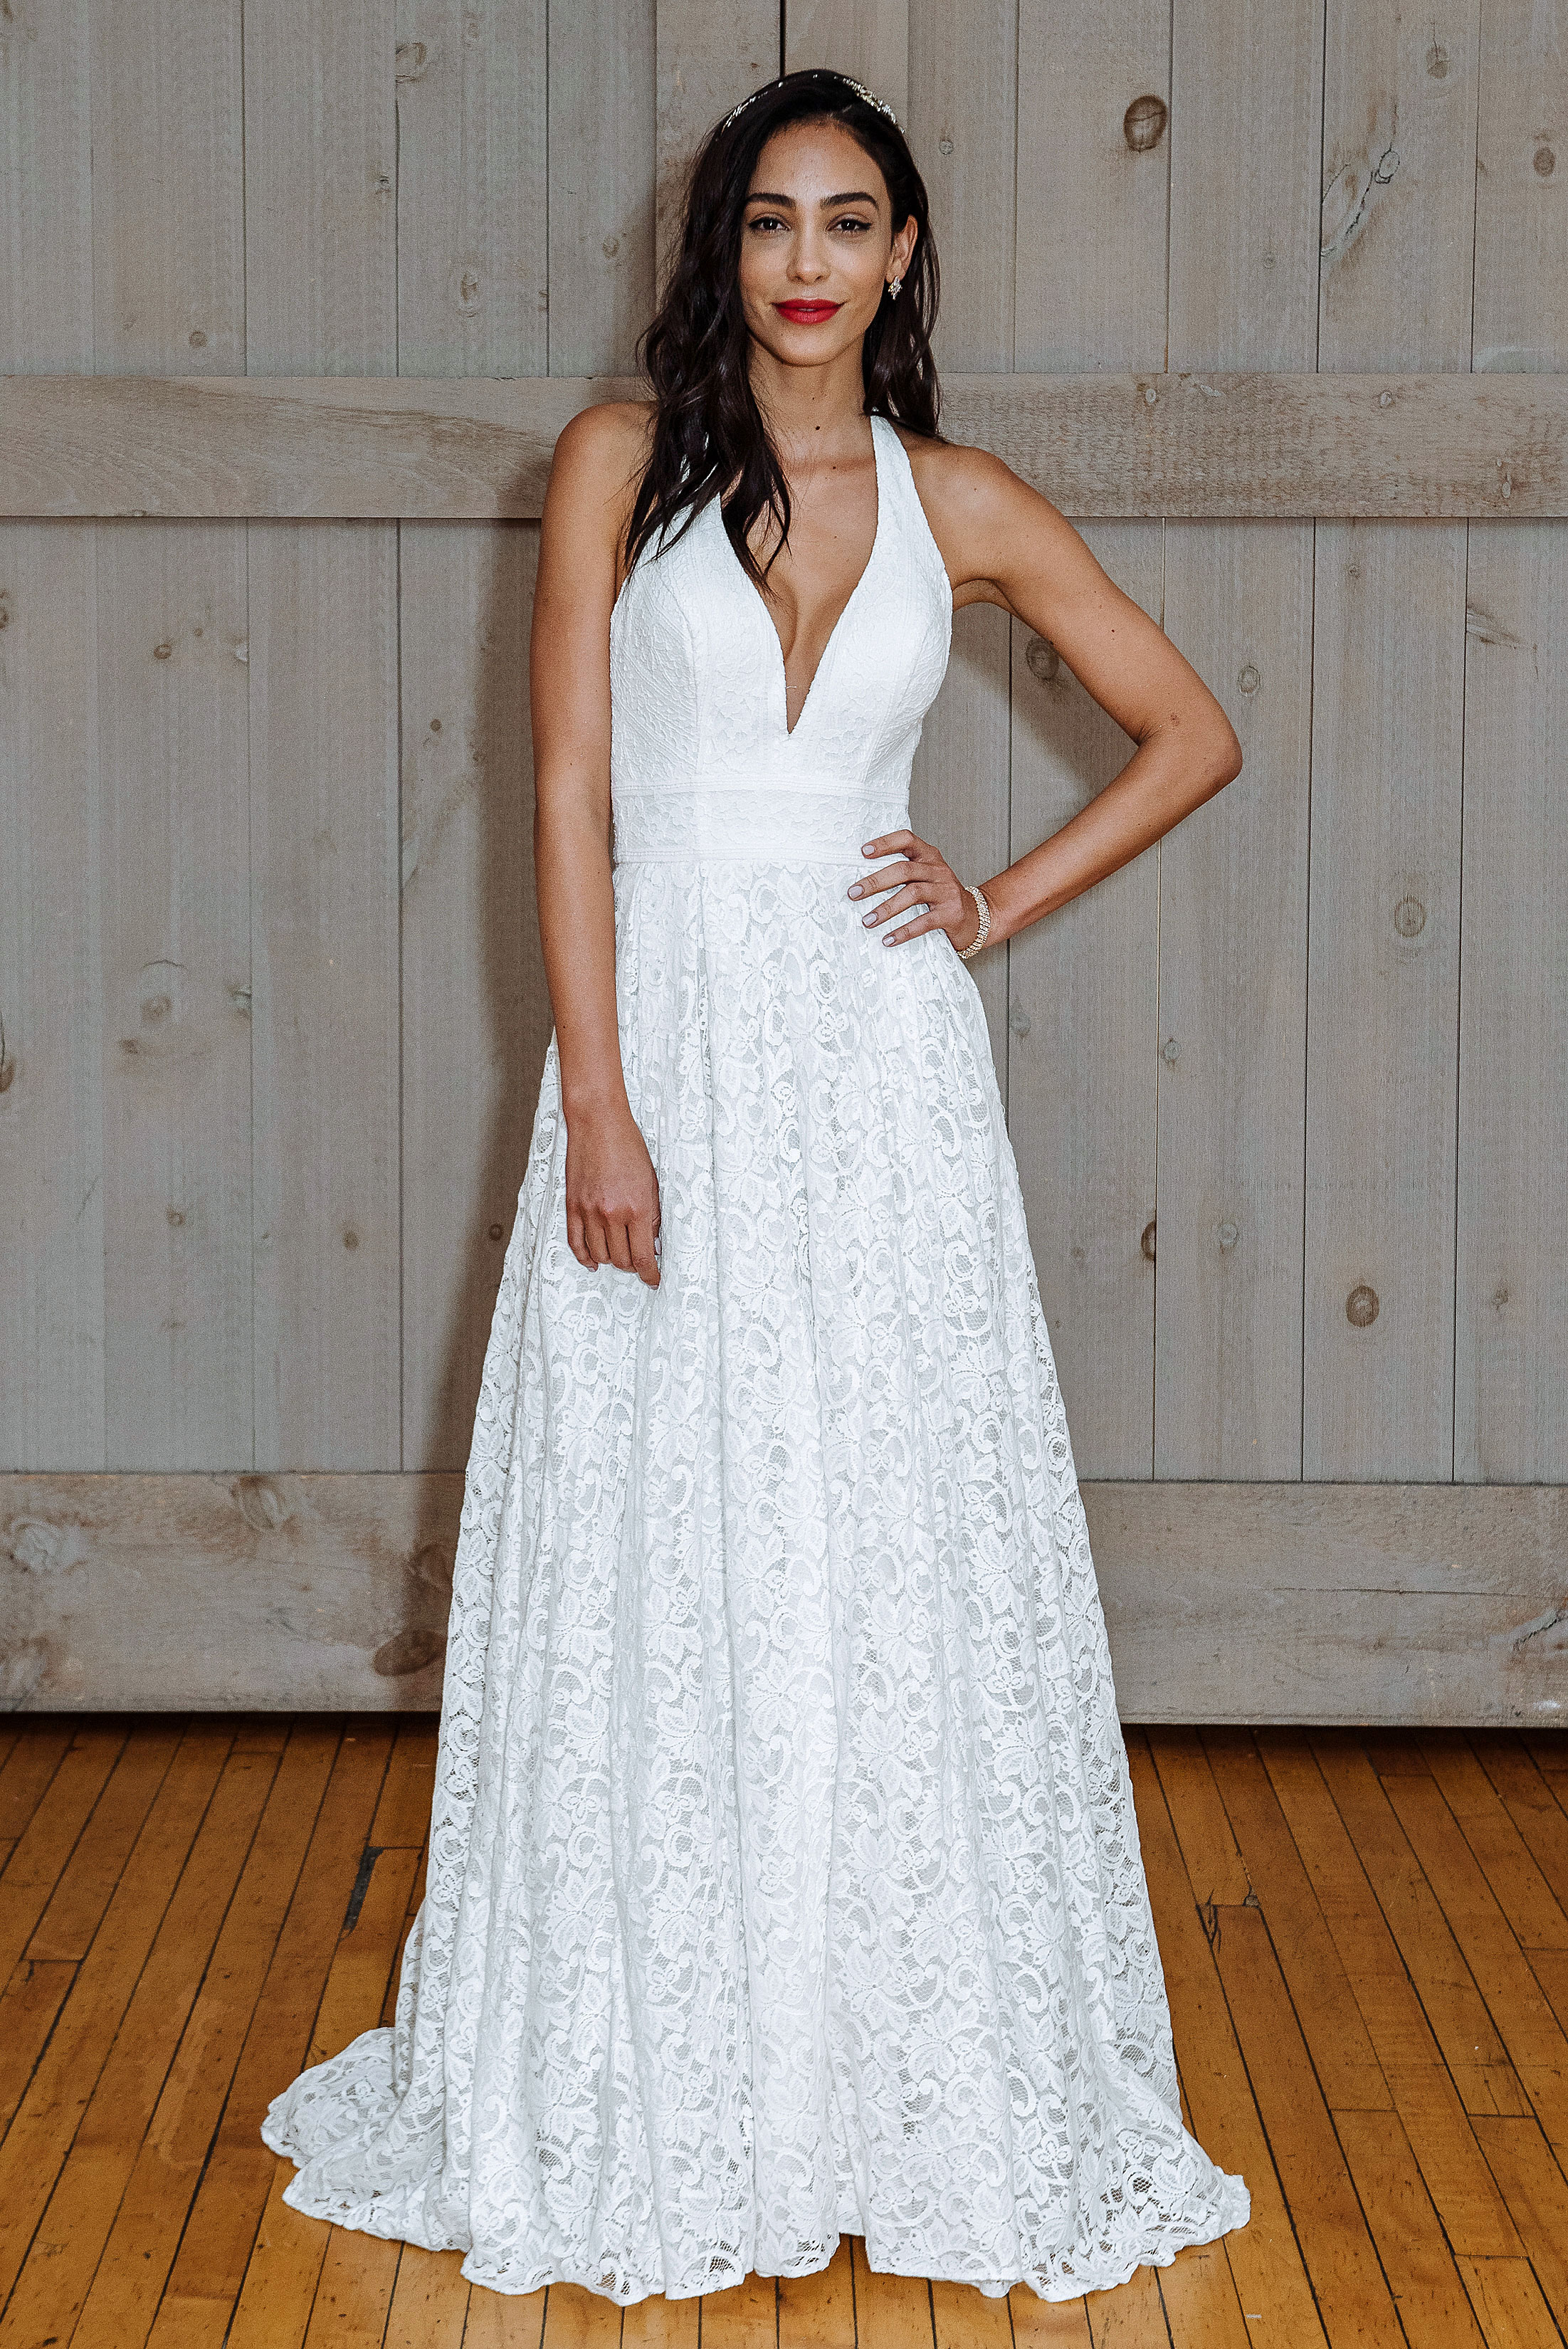 david's bridal low v-neck wedding dress spring 2018